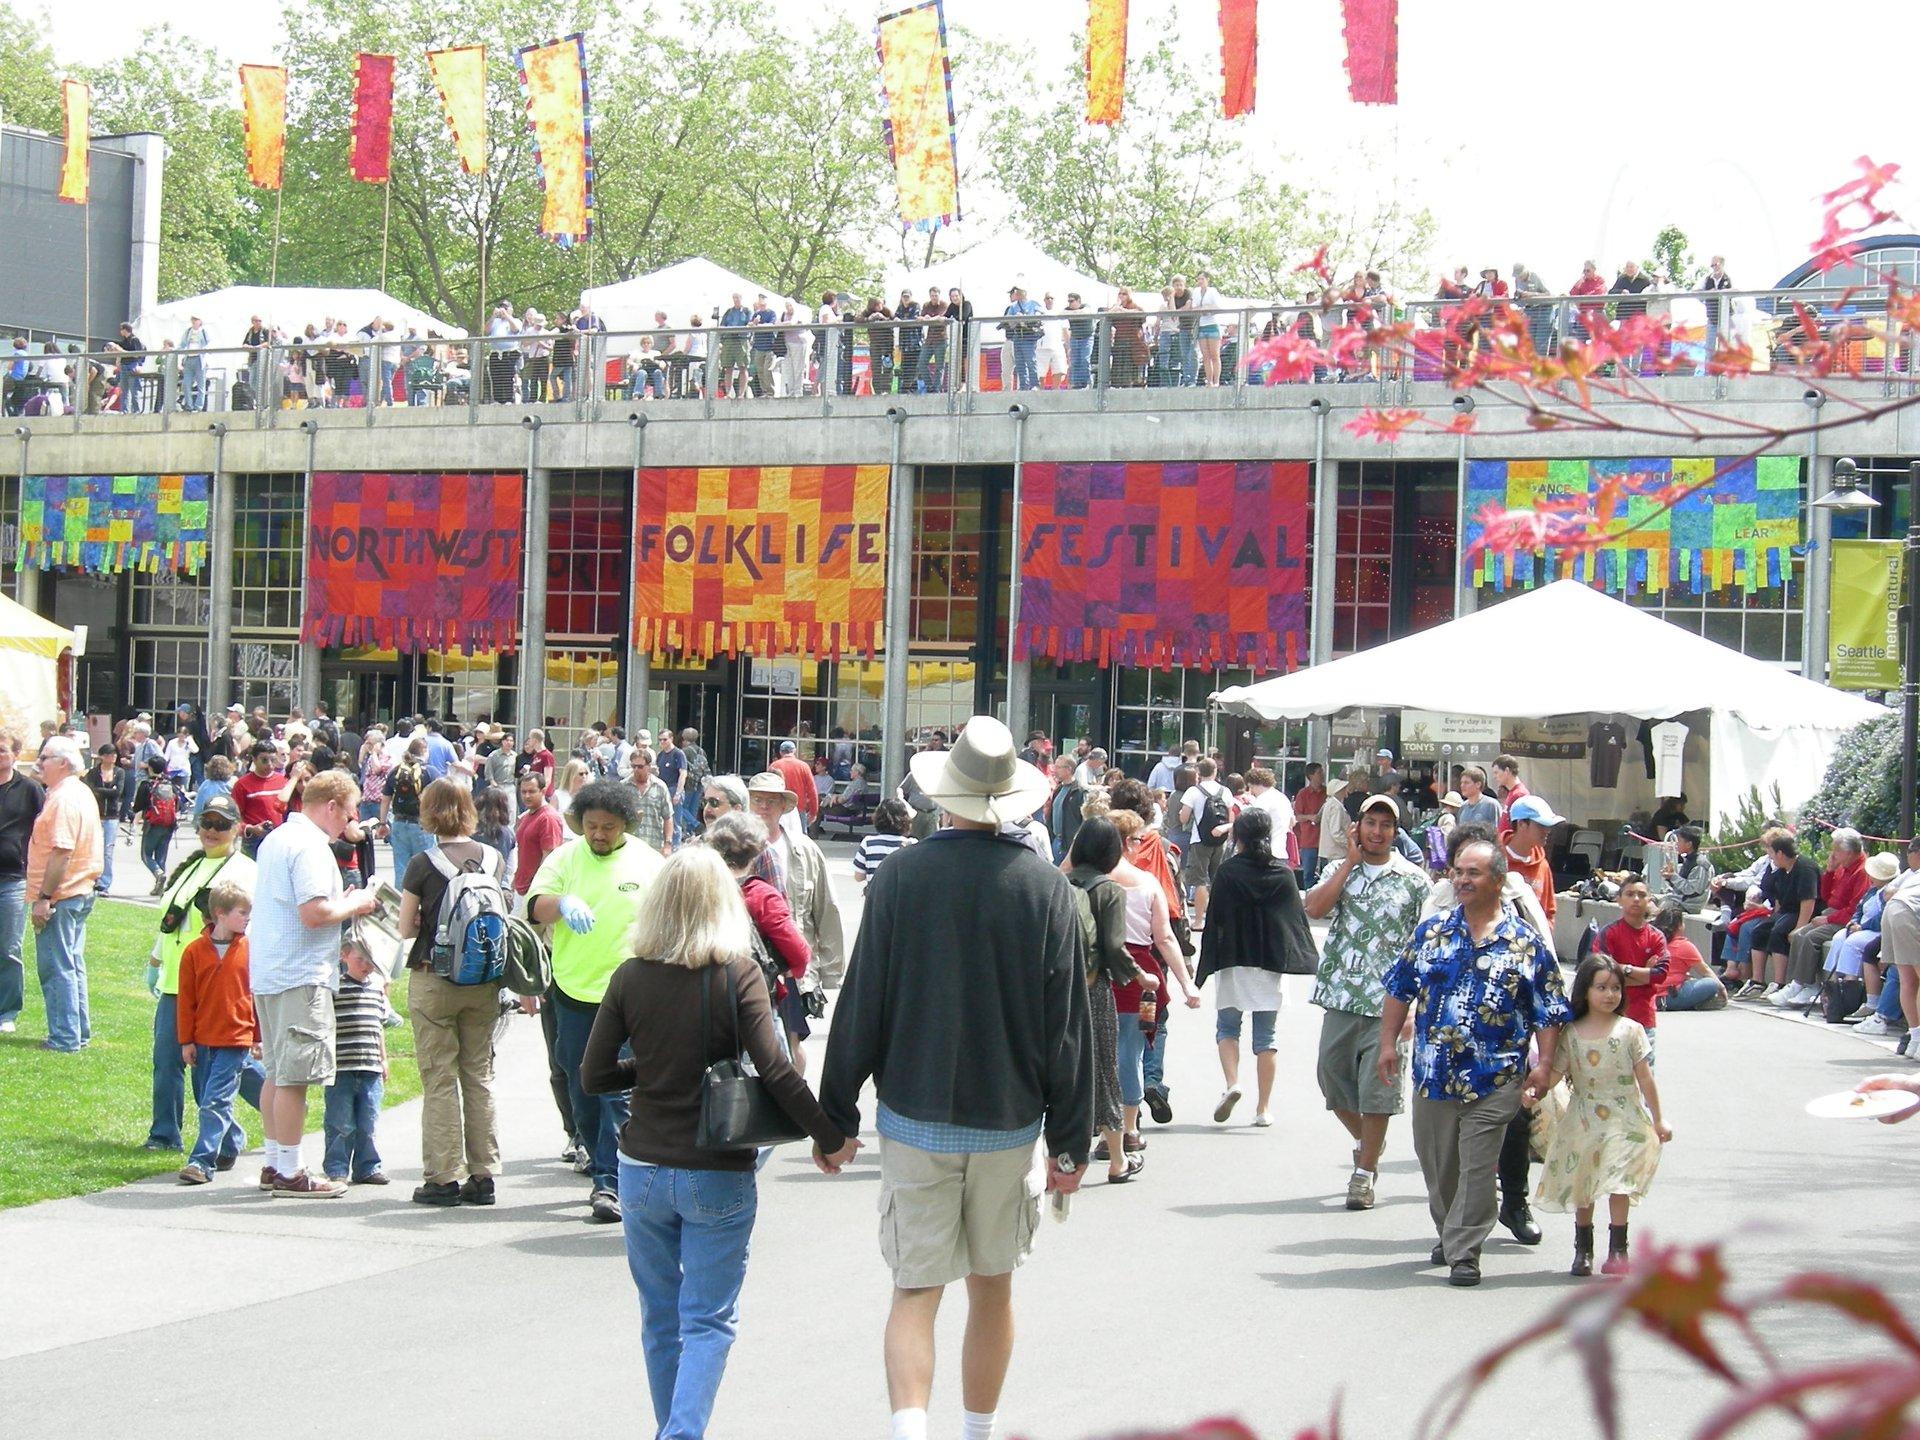 Northwest Folklife Festival in Seattle 2020 - Best Time